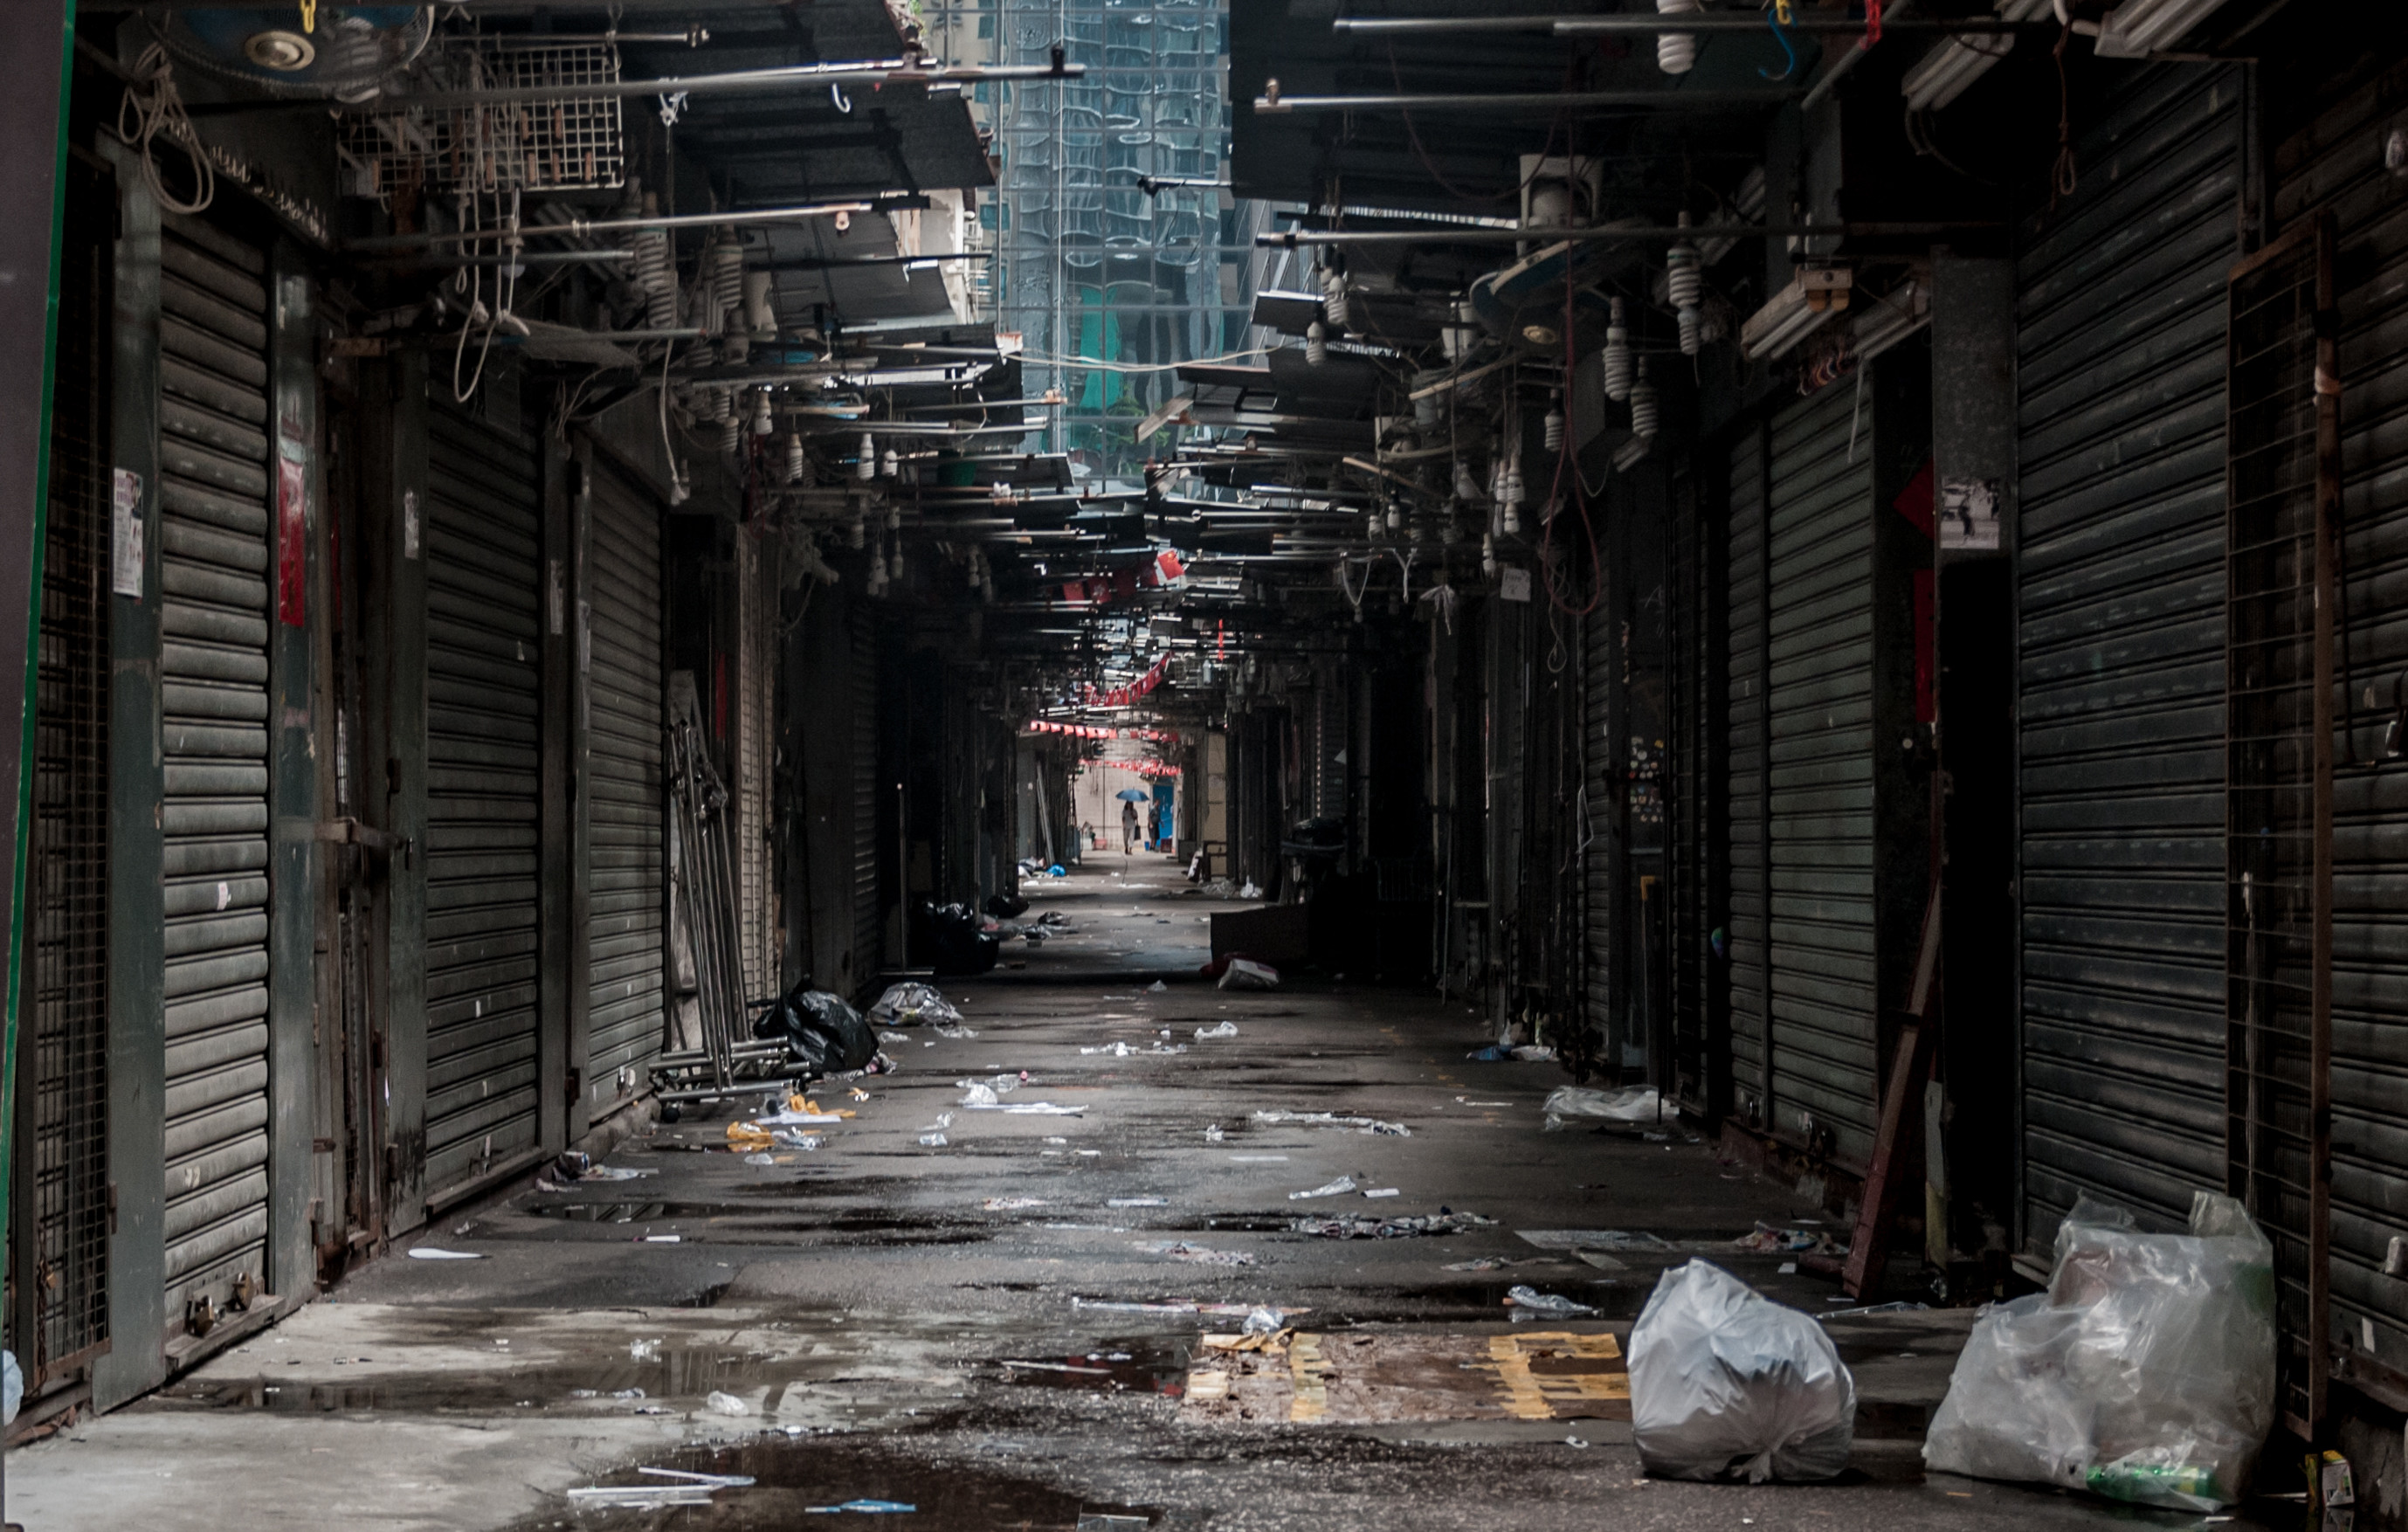 Hong Kong Iphone X Wallpaper Ghetto Backgrounds 183 ①